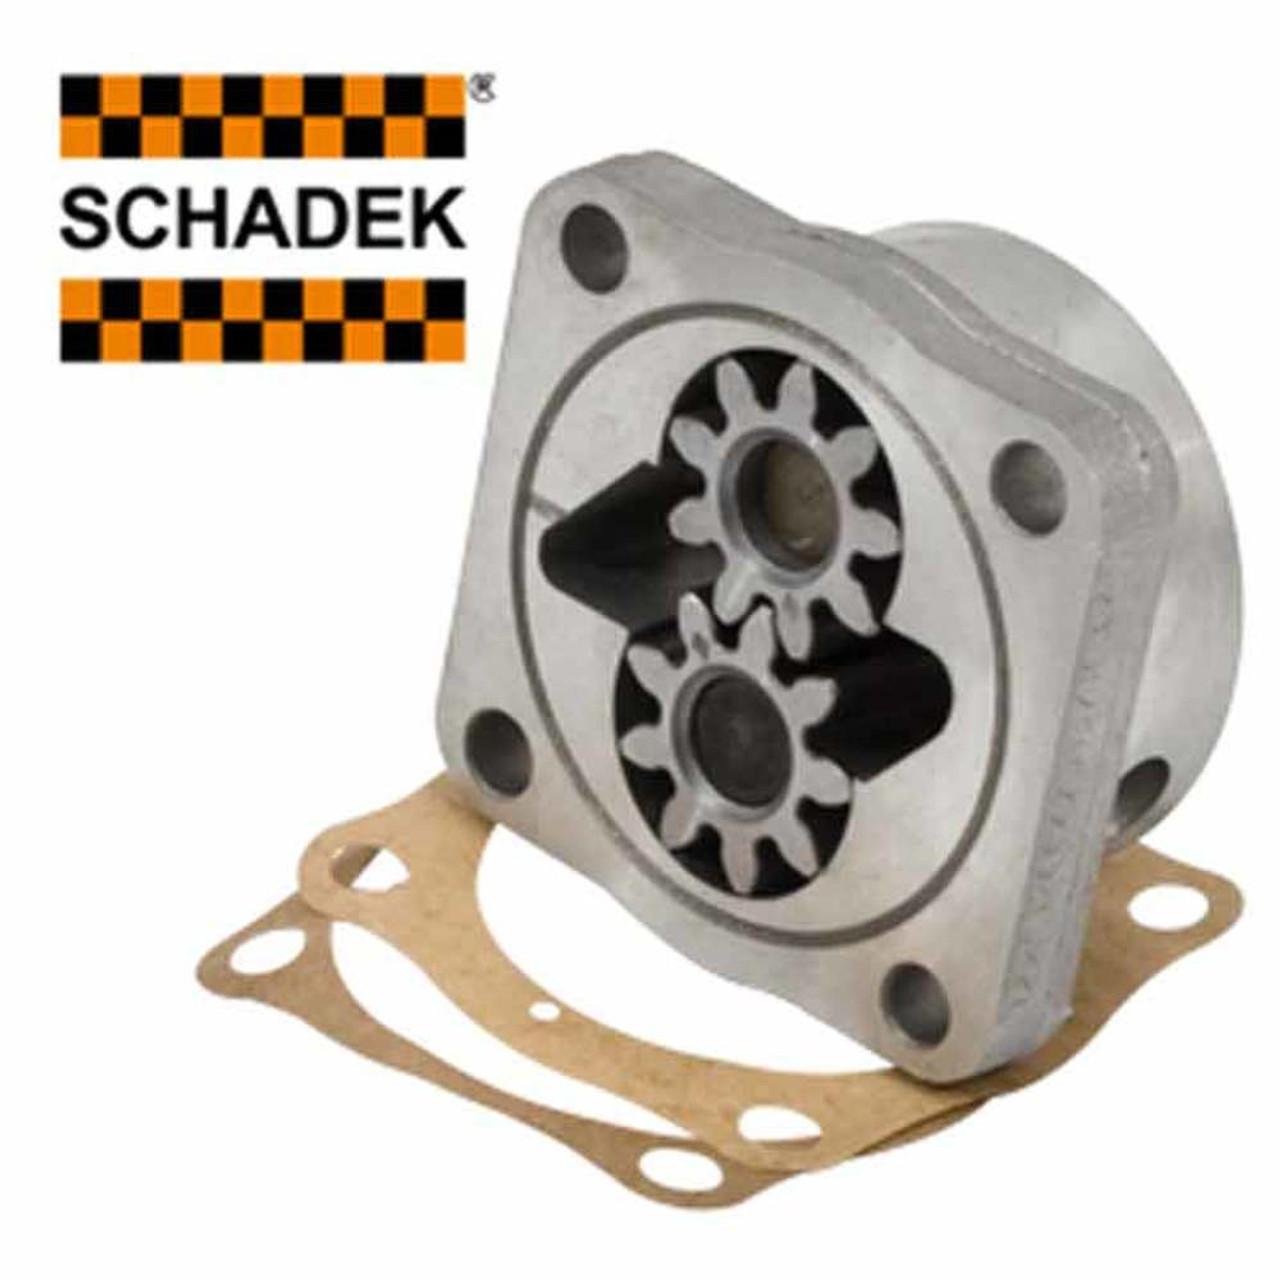 Schadek Oil Pump F/ Flat Cam, 30mm Gears VW, Bug, Beetle EMPI 98-1123-B  10-045 111 115 107AHD